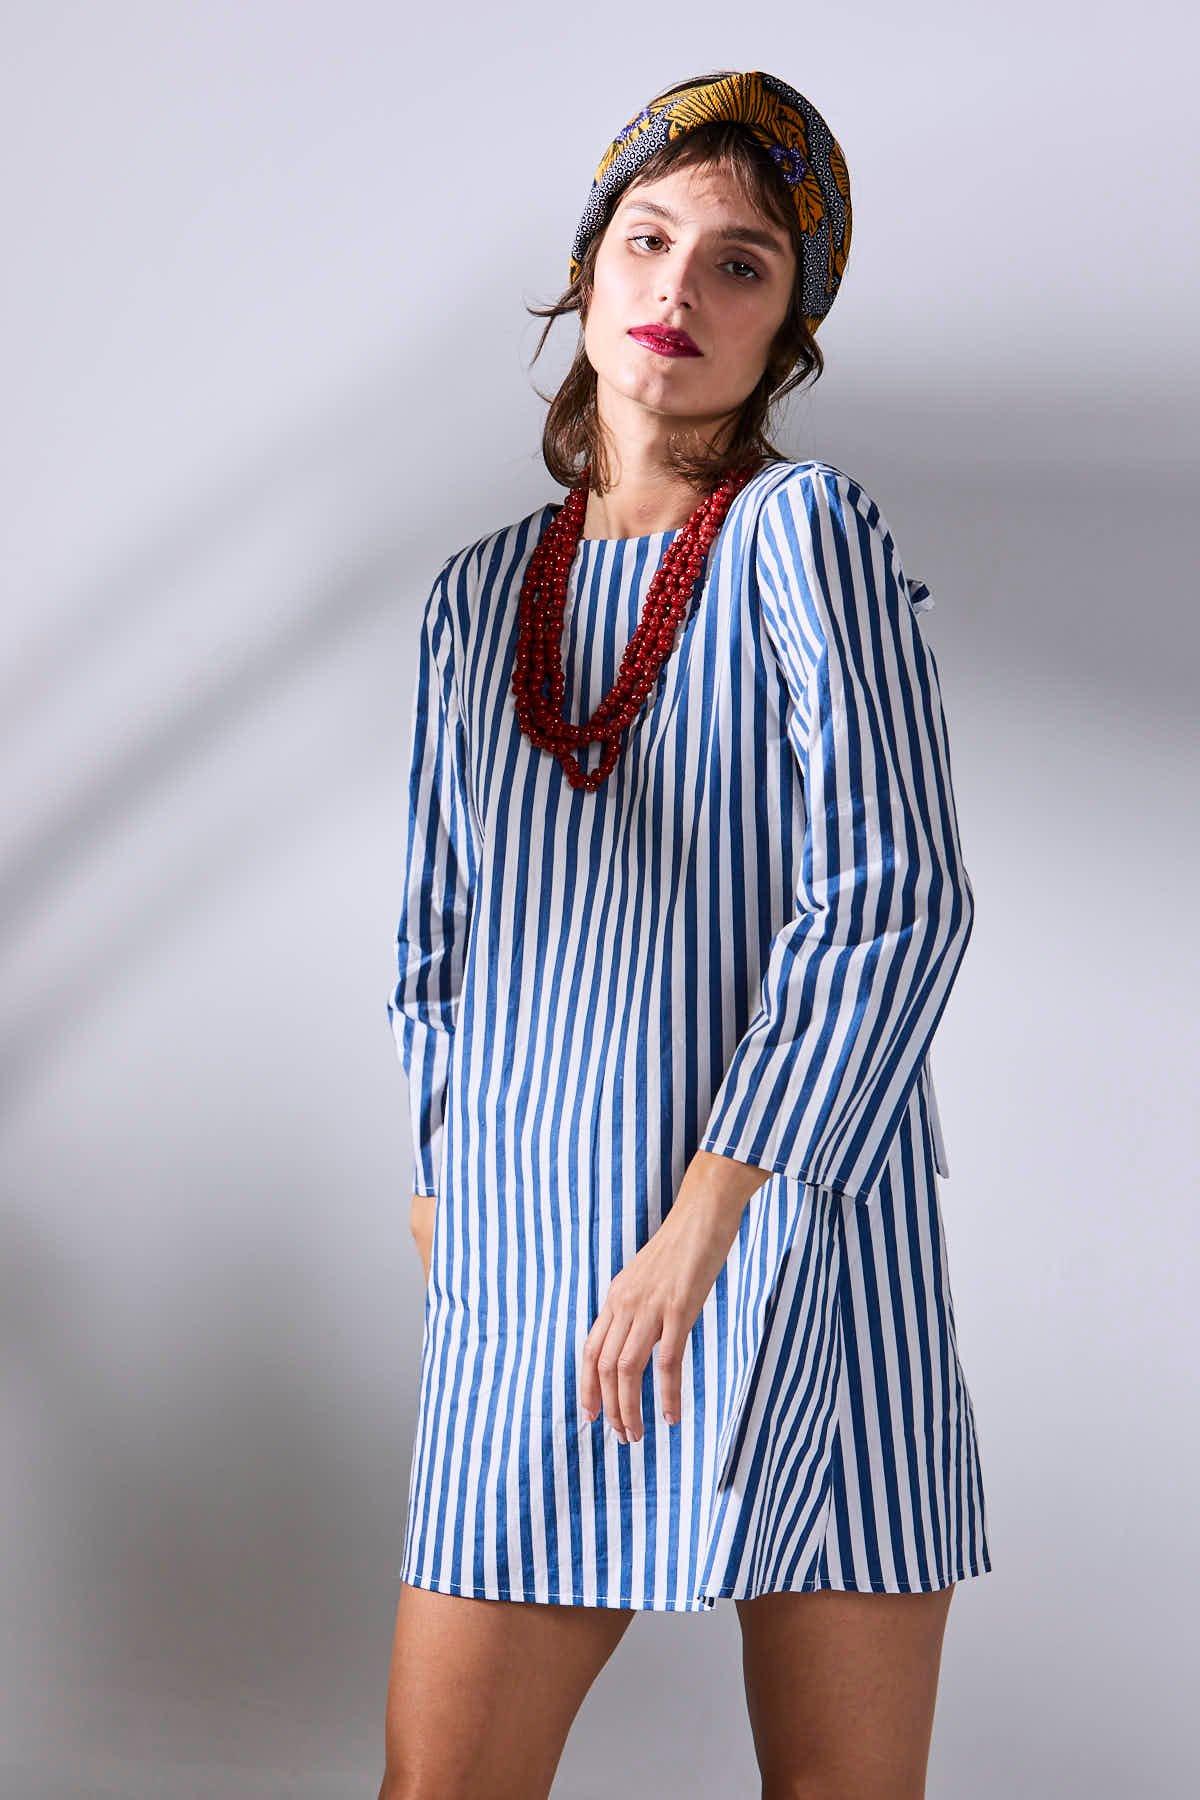 Image of Vestido Negresco Rayas Azul